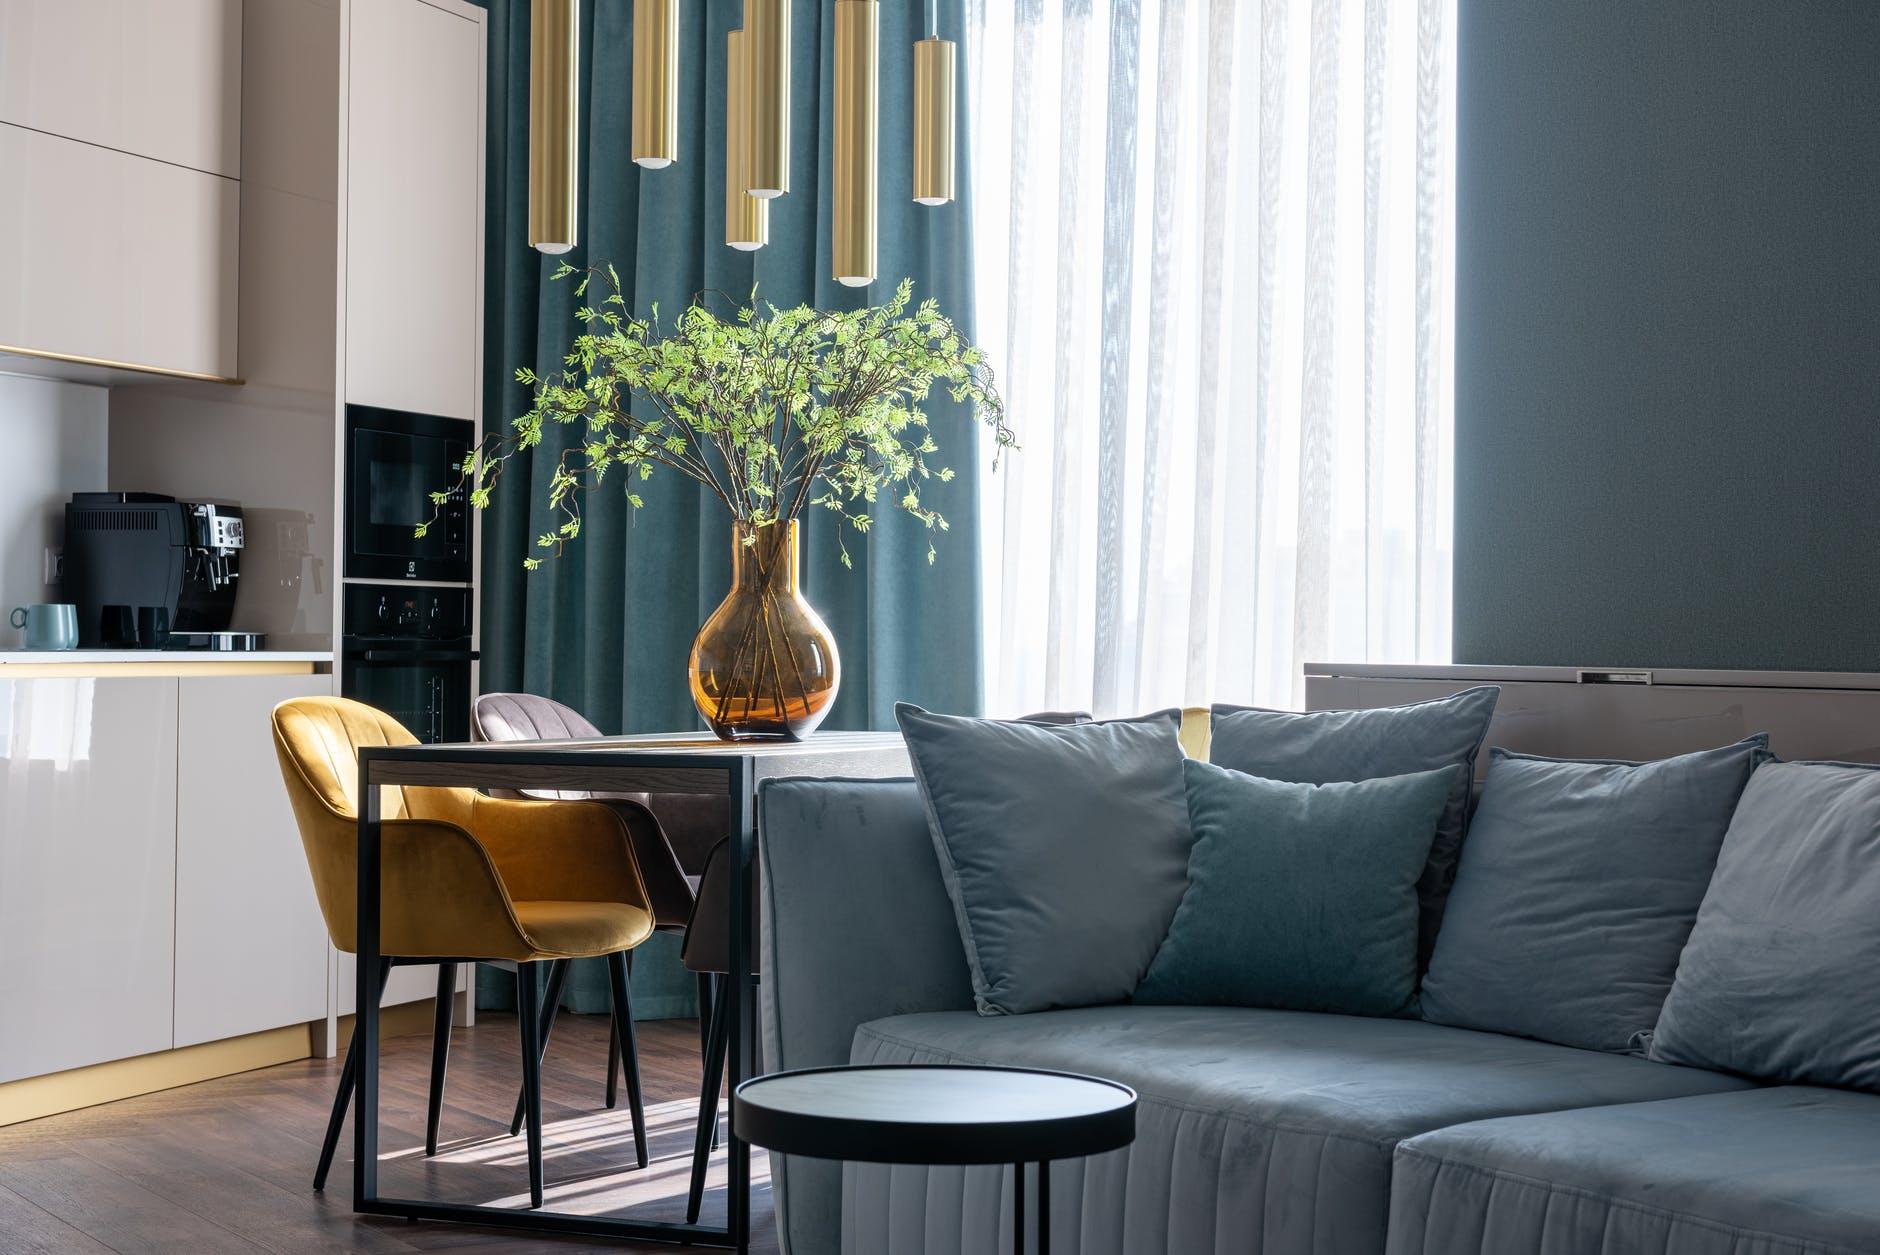 modern studio apartment interior with sofa and kitchen zone